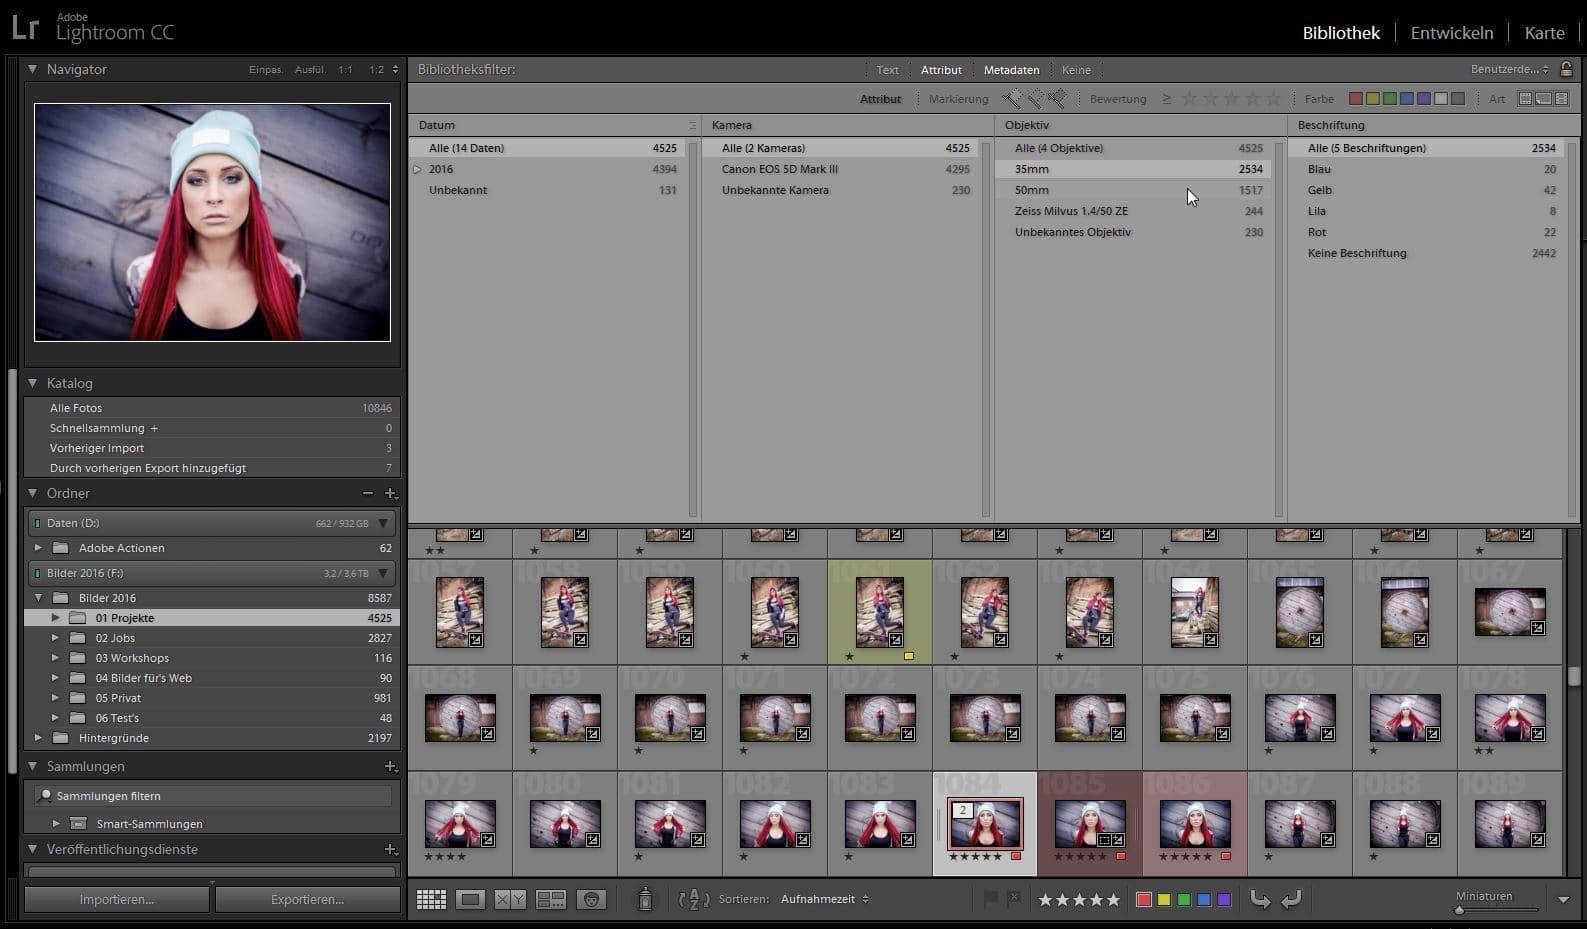 portrait brennweite, portraitfotografie, sigma art 35mm, 50mm Objektiv, Lightroom